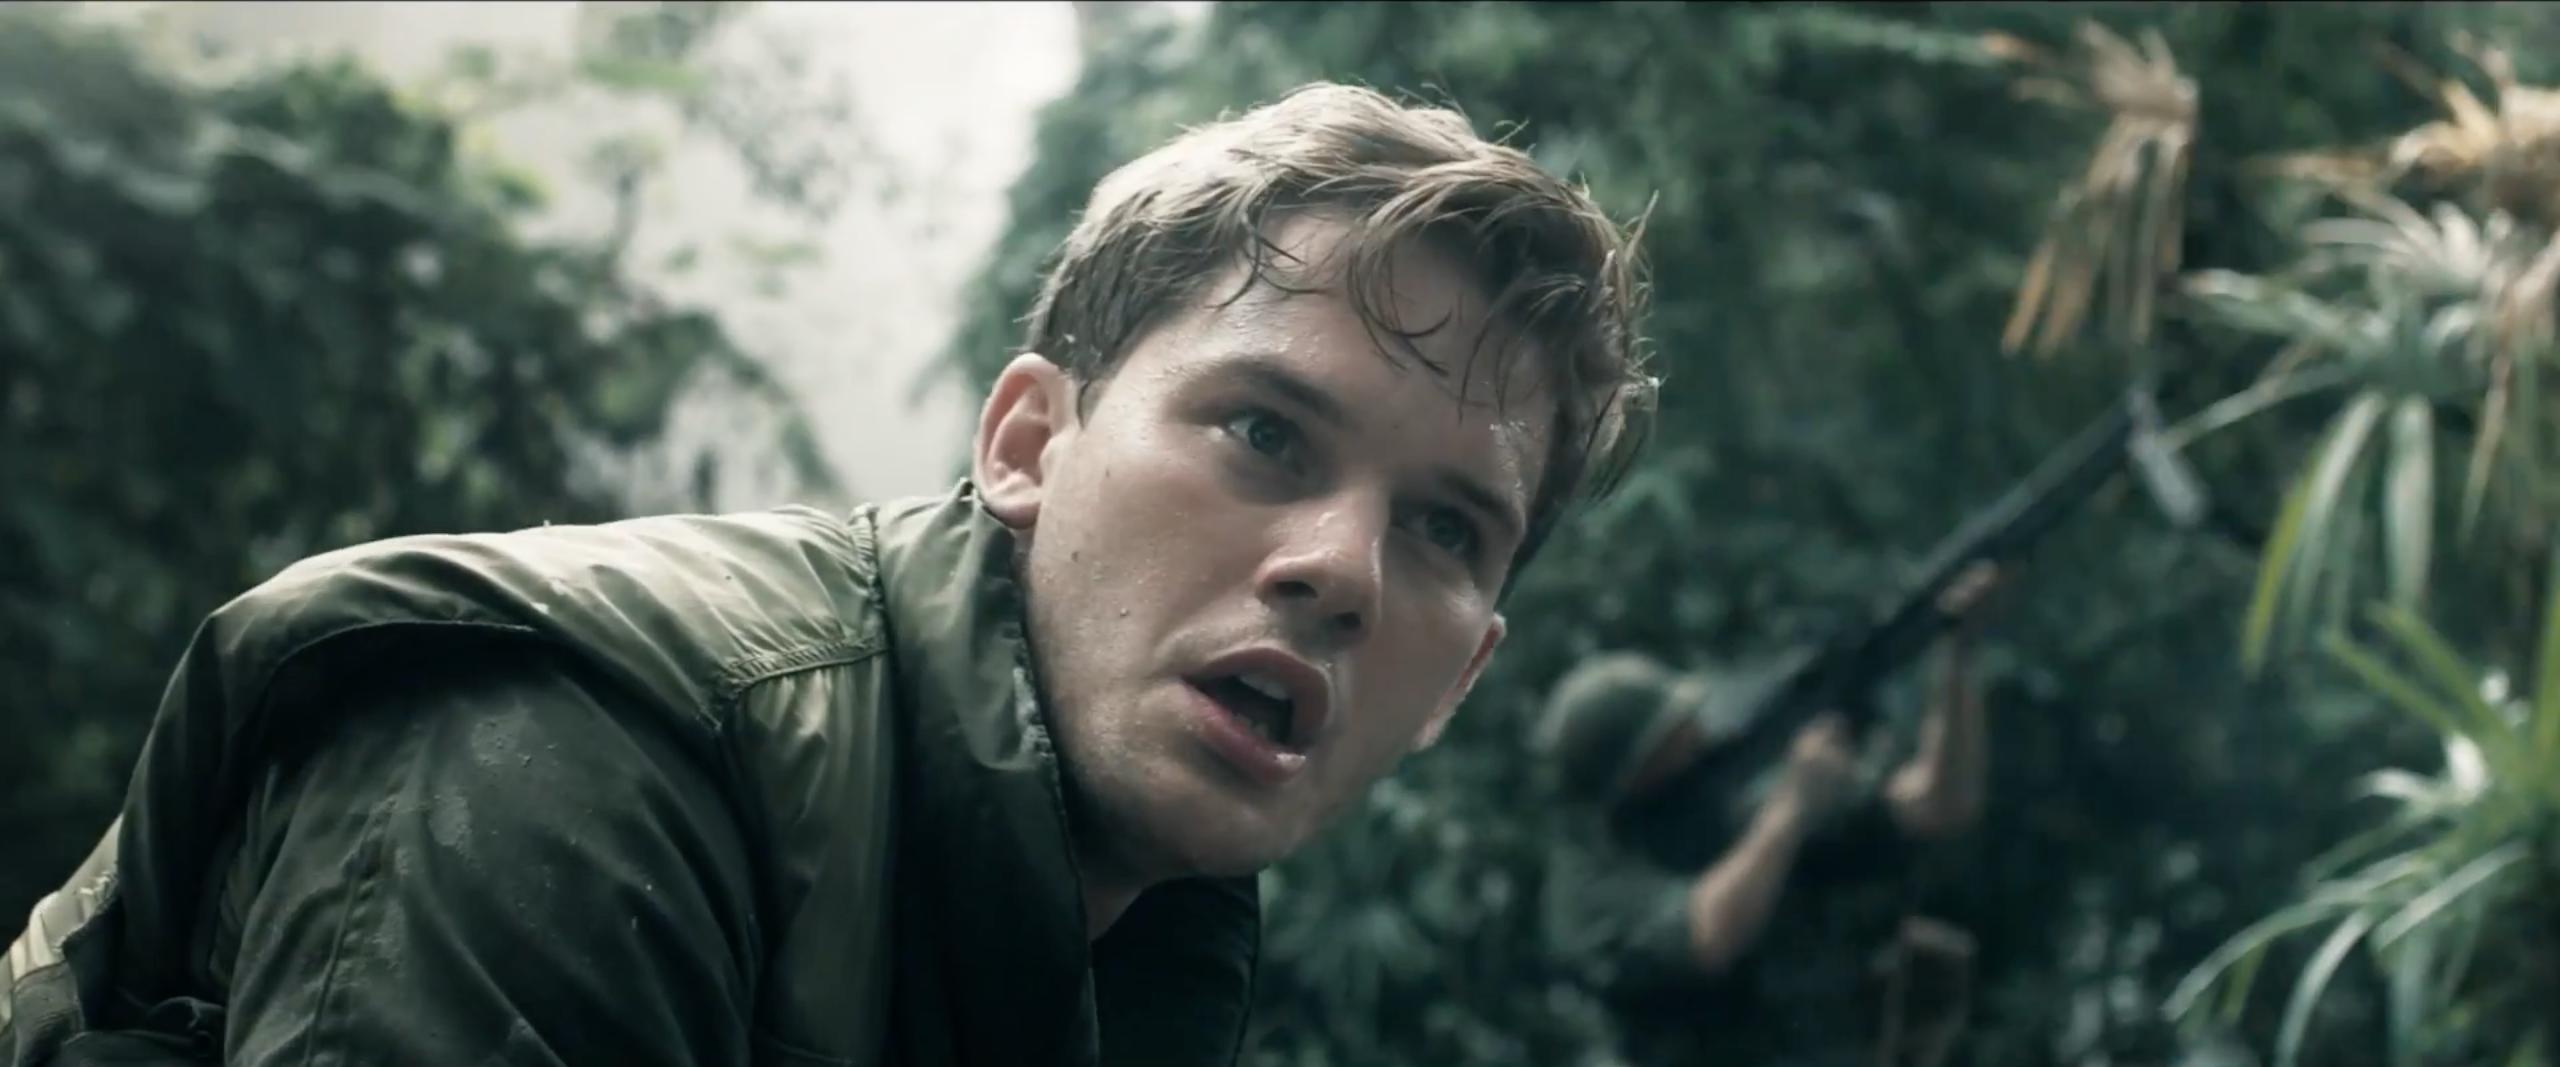 'The Last Full Measure' Shines Powerful Light on a True Hero of the Vietnam War